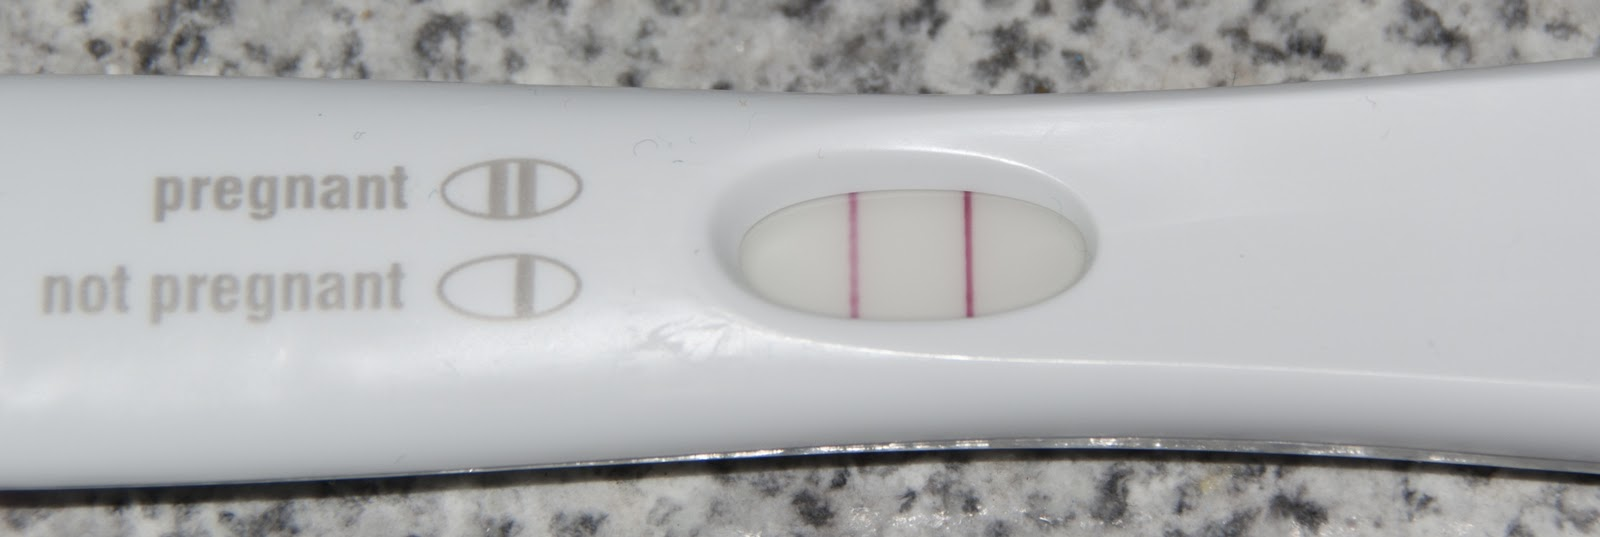 Metformin Ovulation Calculator Viagra E Simili